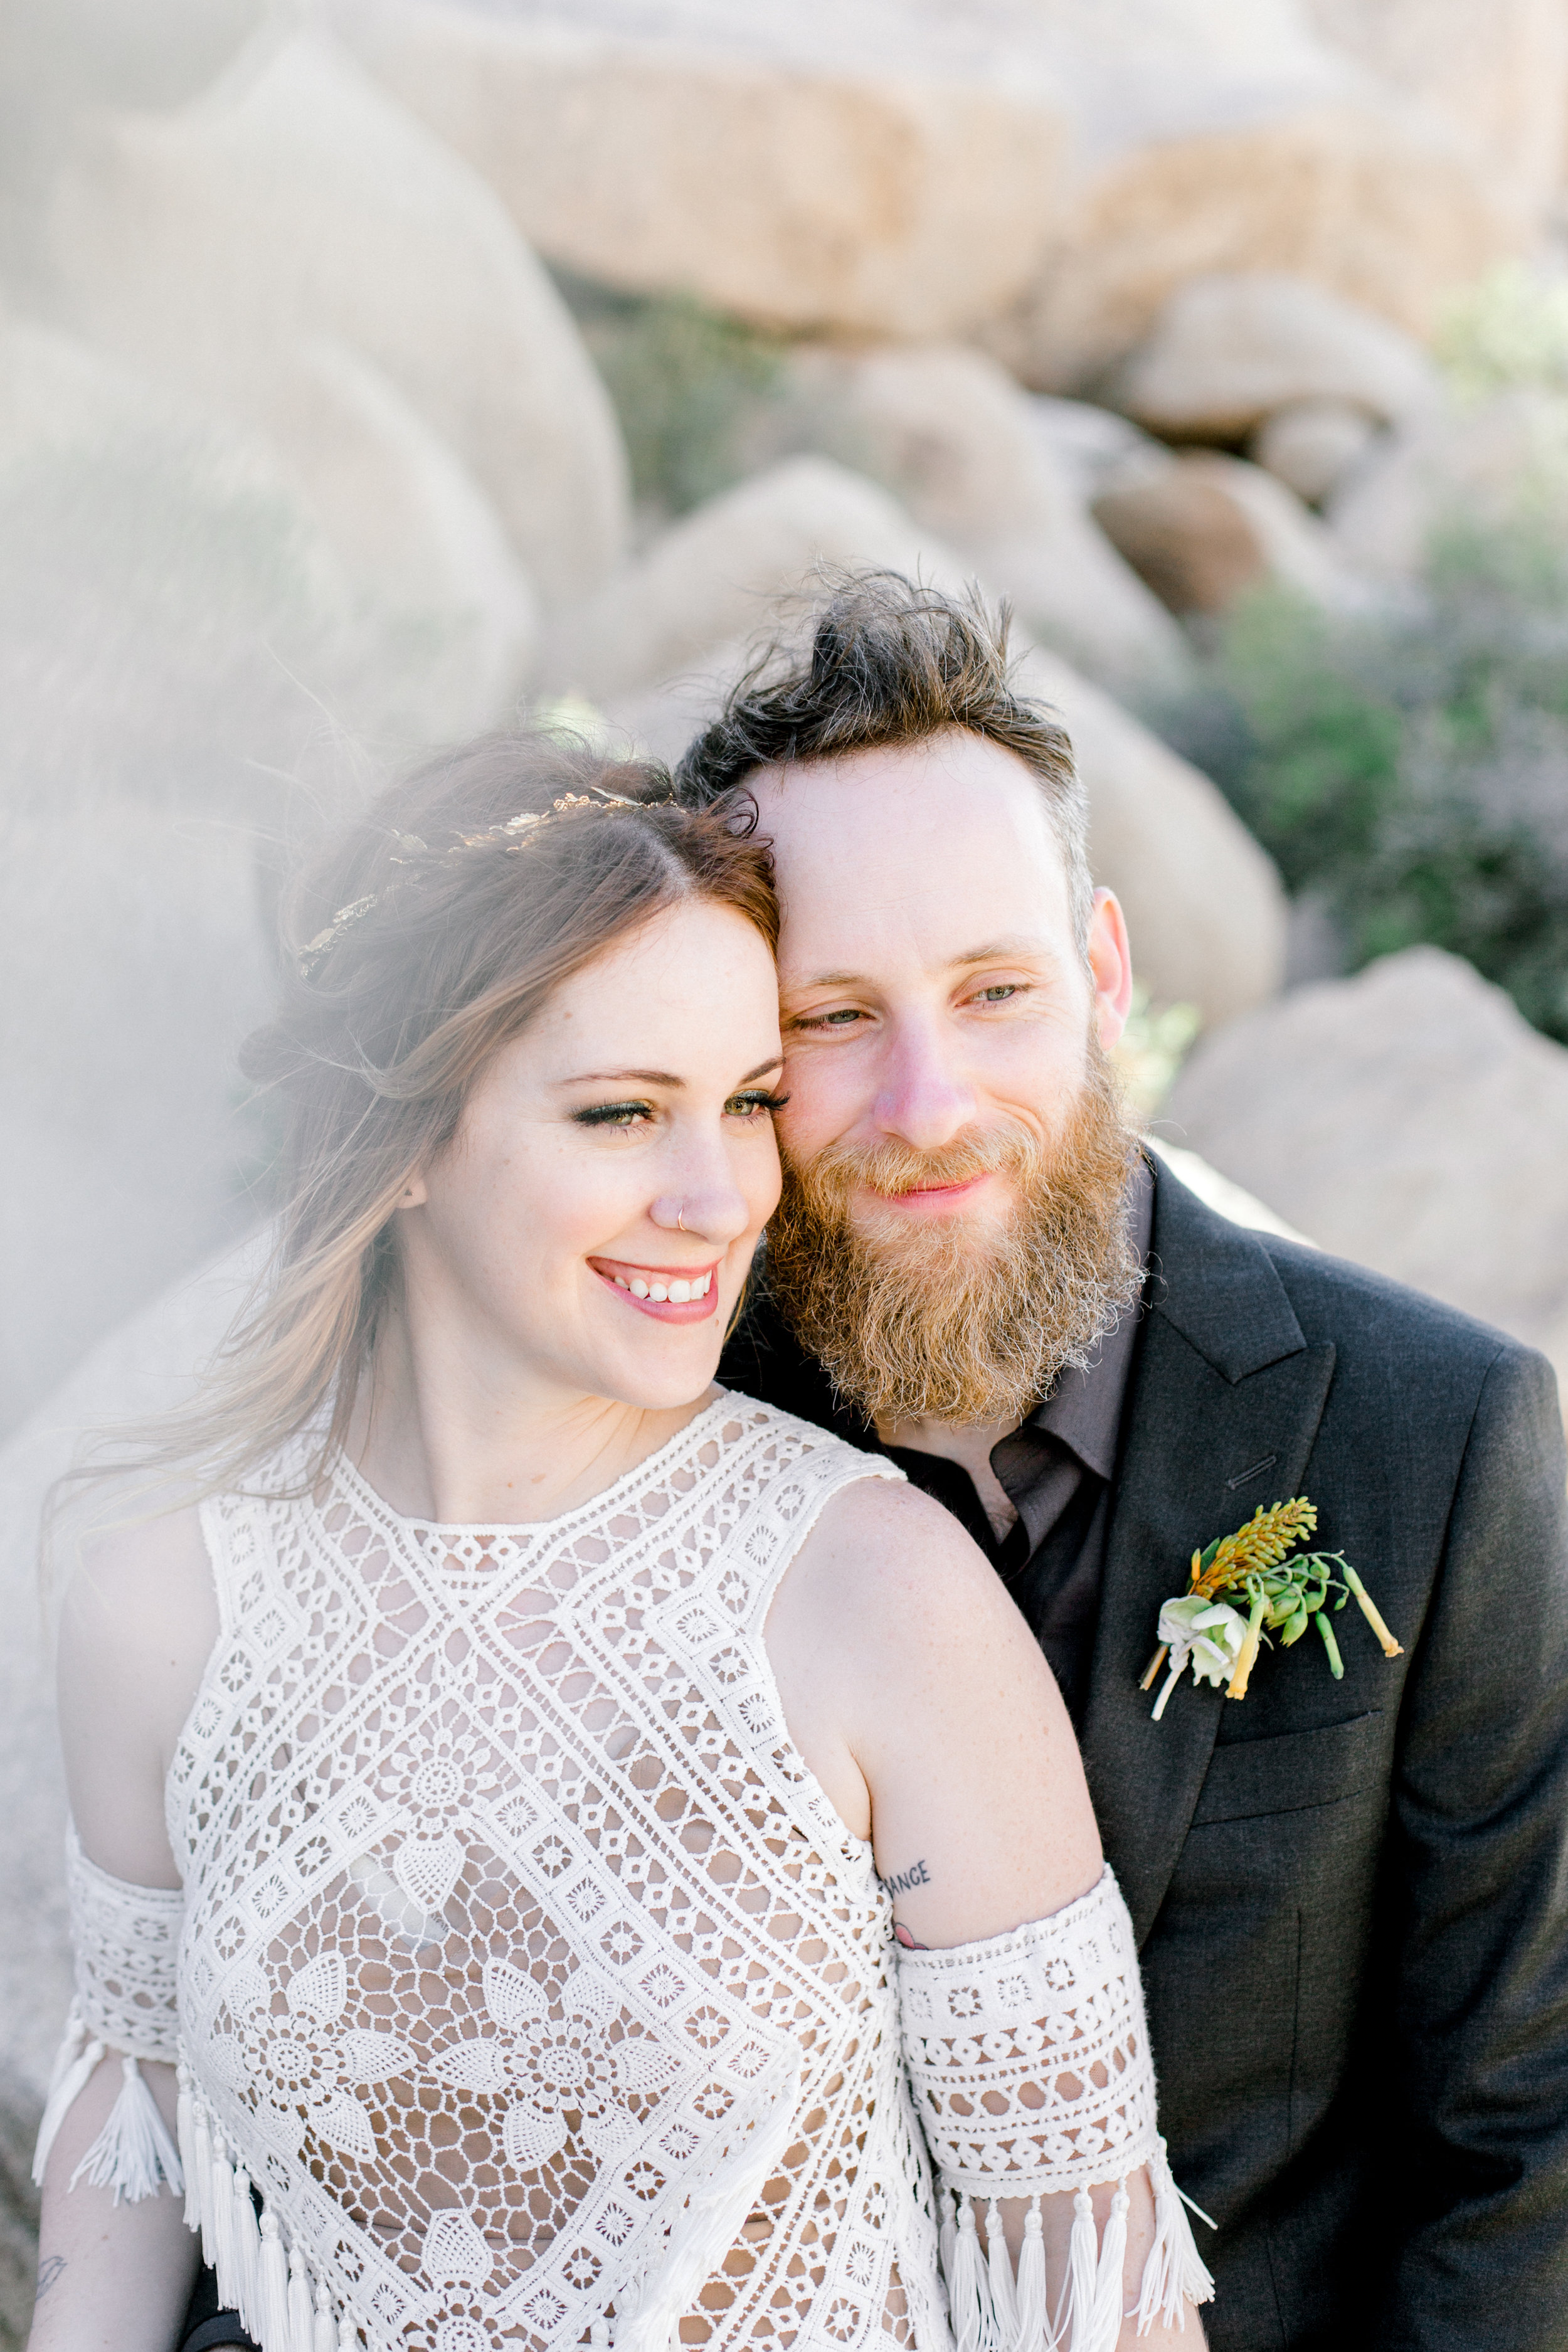 jessica sgubin photography atlanta portrait photographer engagement family couple wedding joshua tree wedding elopement-1-8.jpg